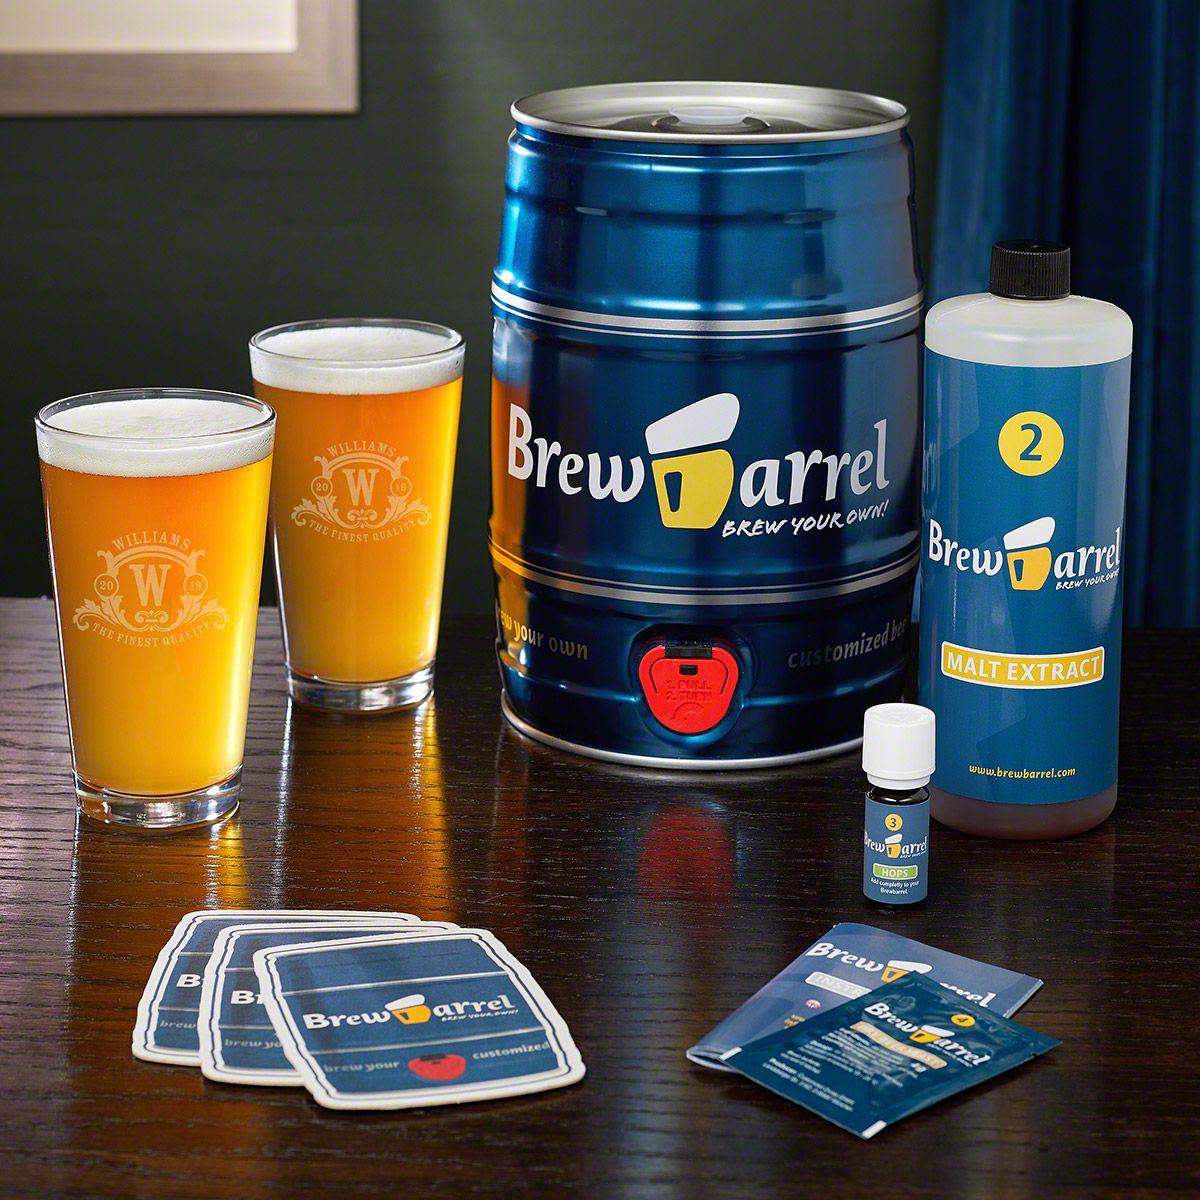 Westbrook Monogram Pint Set and Brew Barrel Beer Making Kit